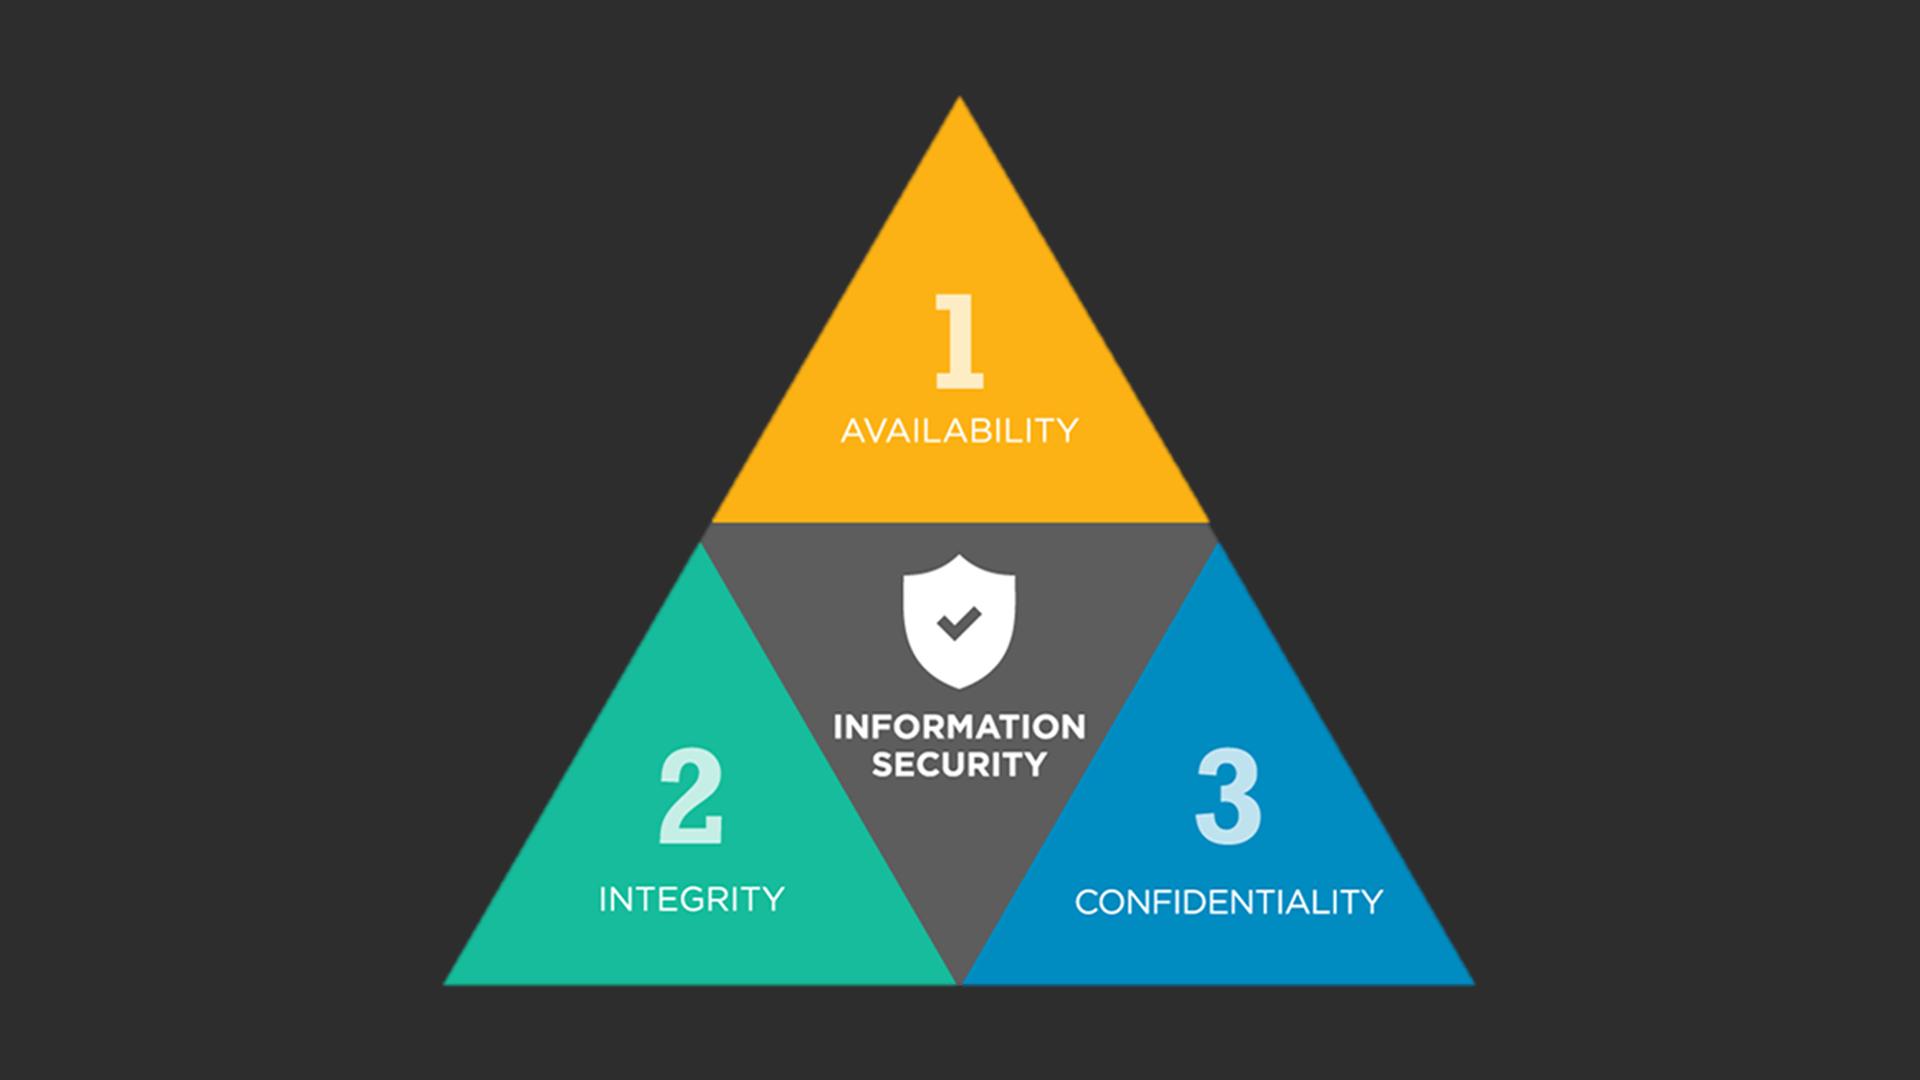 CIA Triad: Confidentiality, Integrity, Availability